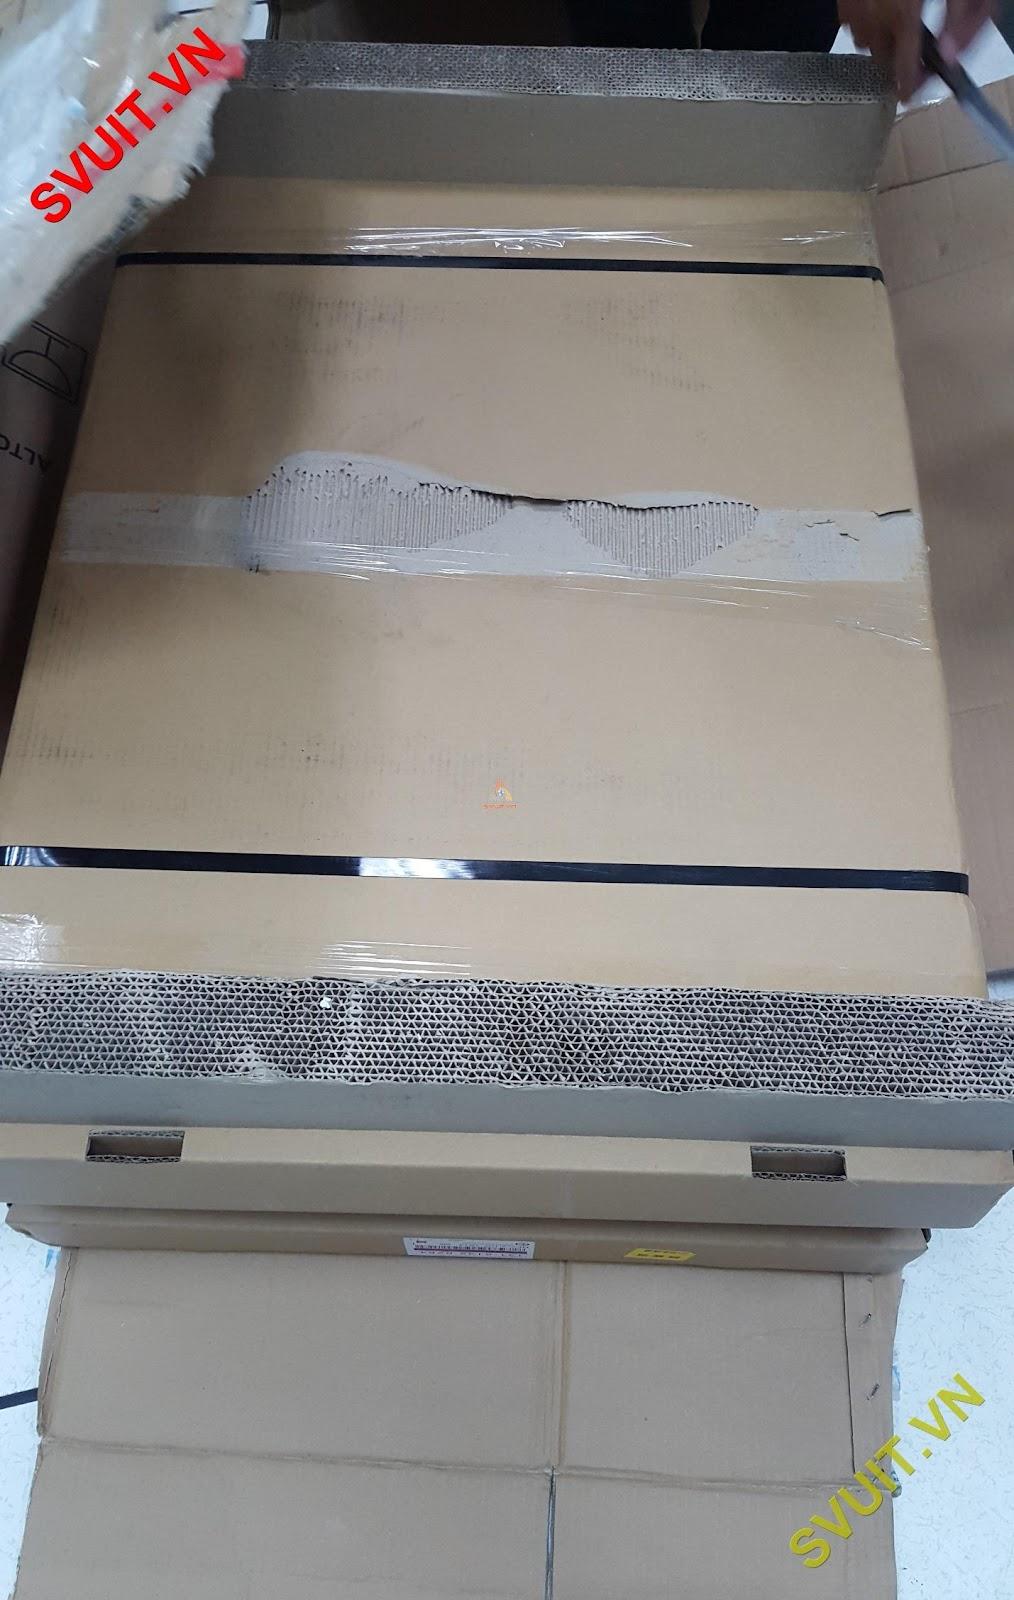 Drive Enclosure ETERNUS AF650 unboxing #1